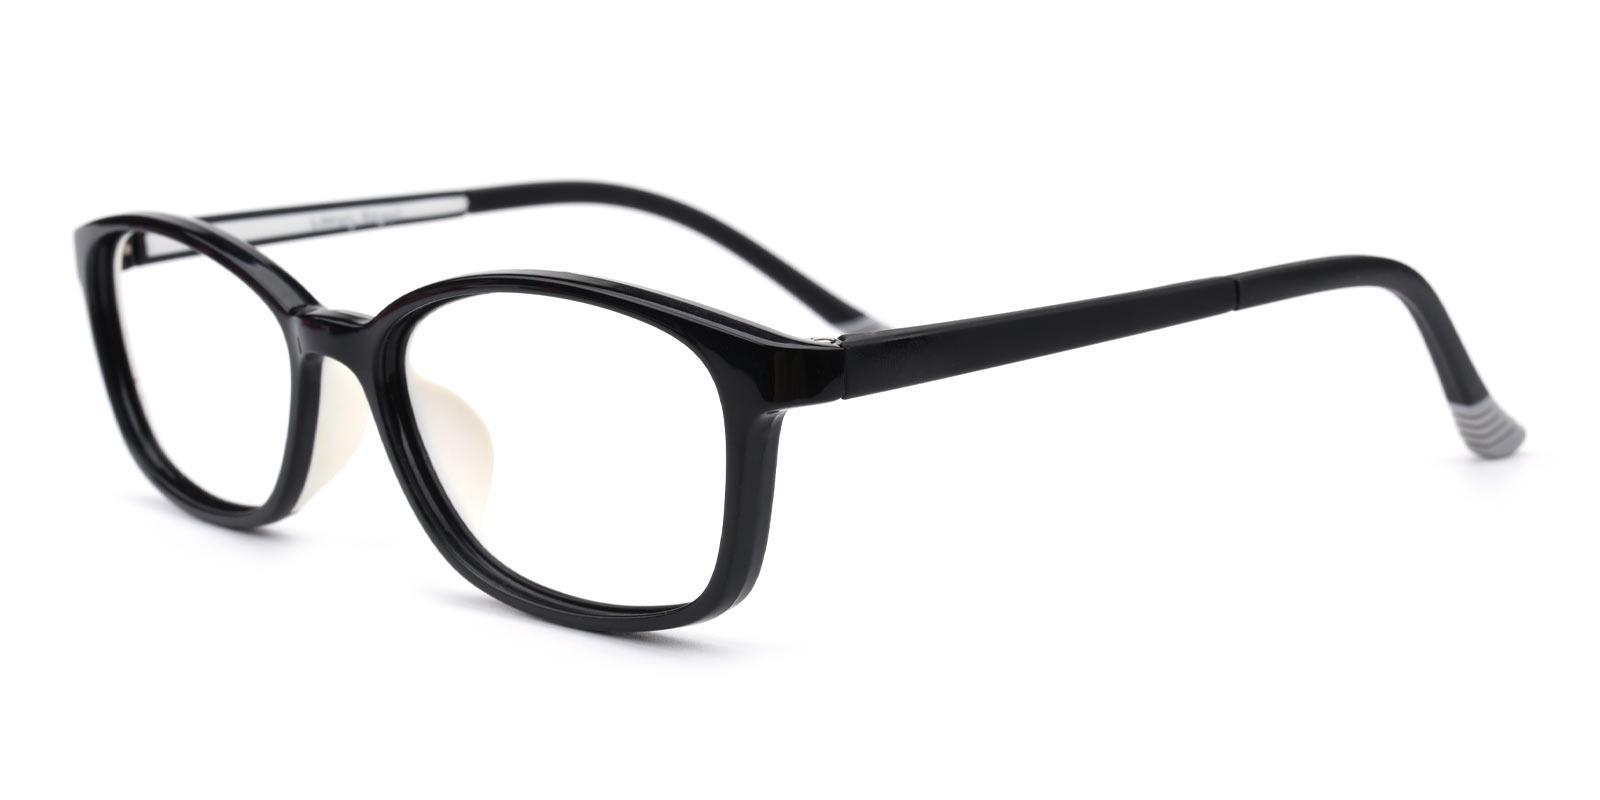 Taylor-Black-Rectangle-TR-Eyeglasses-detail